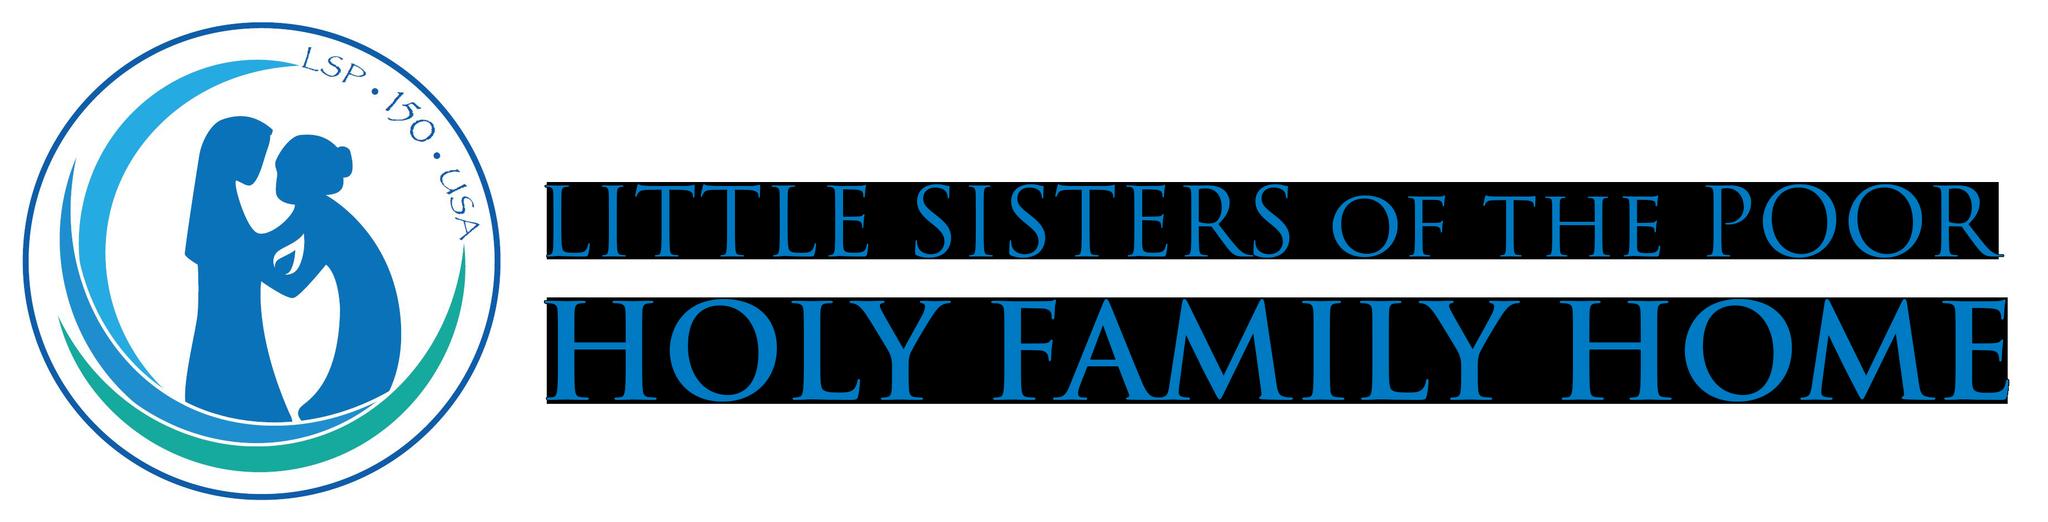 Little Sisters of the Poor Philadelphia